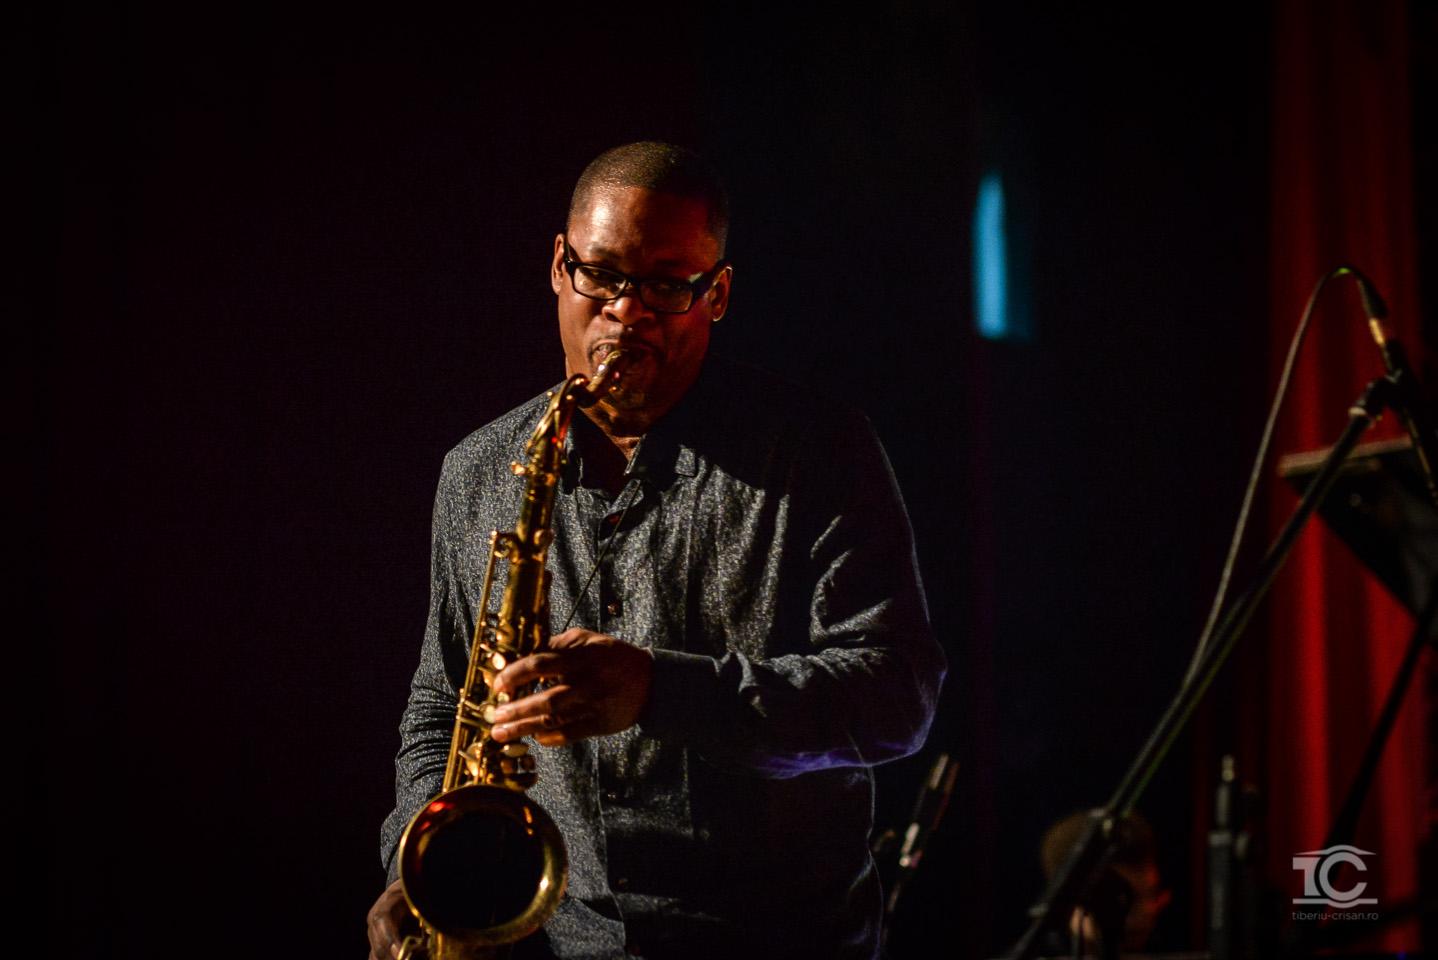 Concert Ravi Coltrane la Cluj